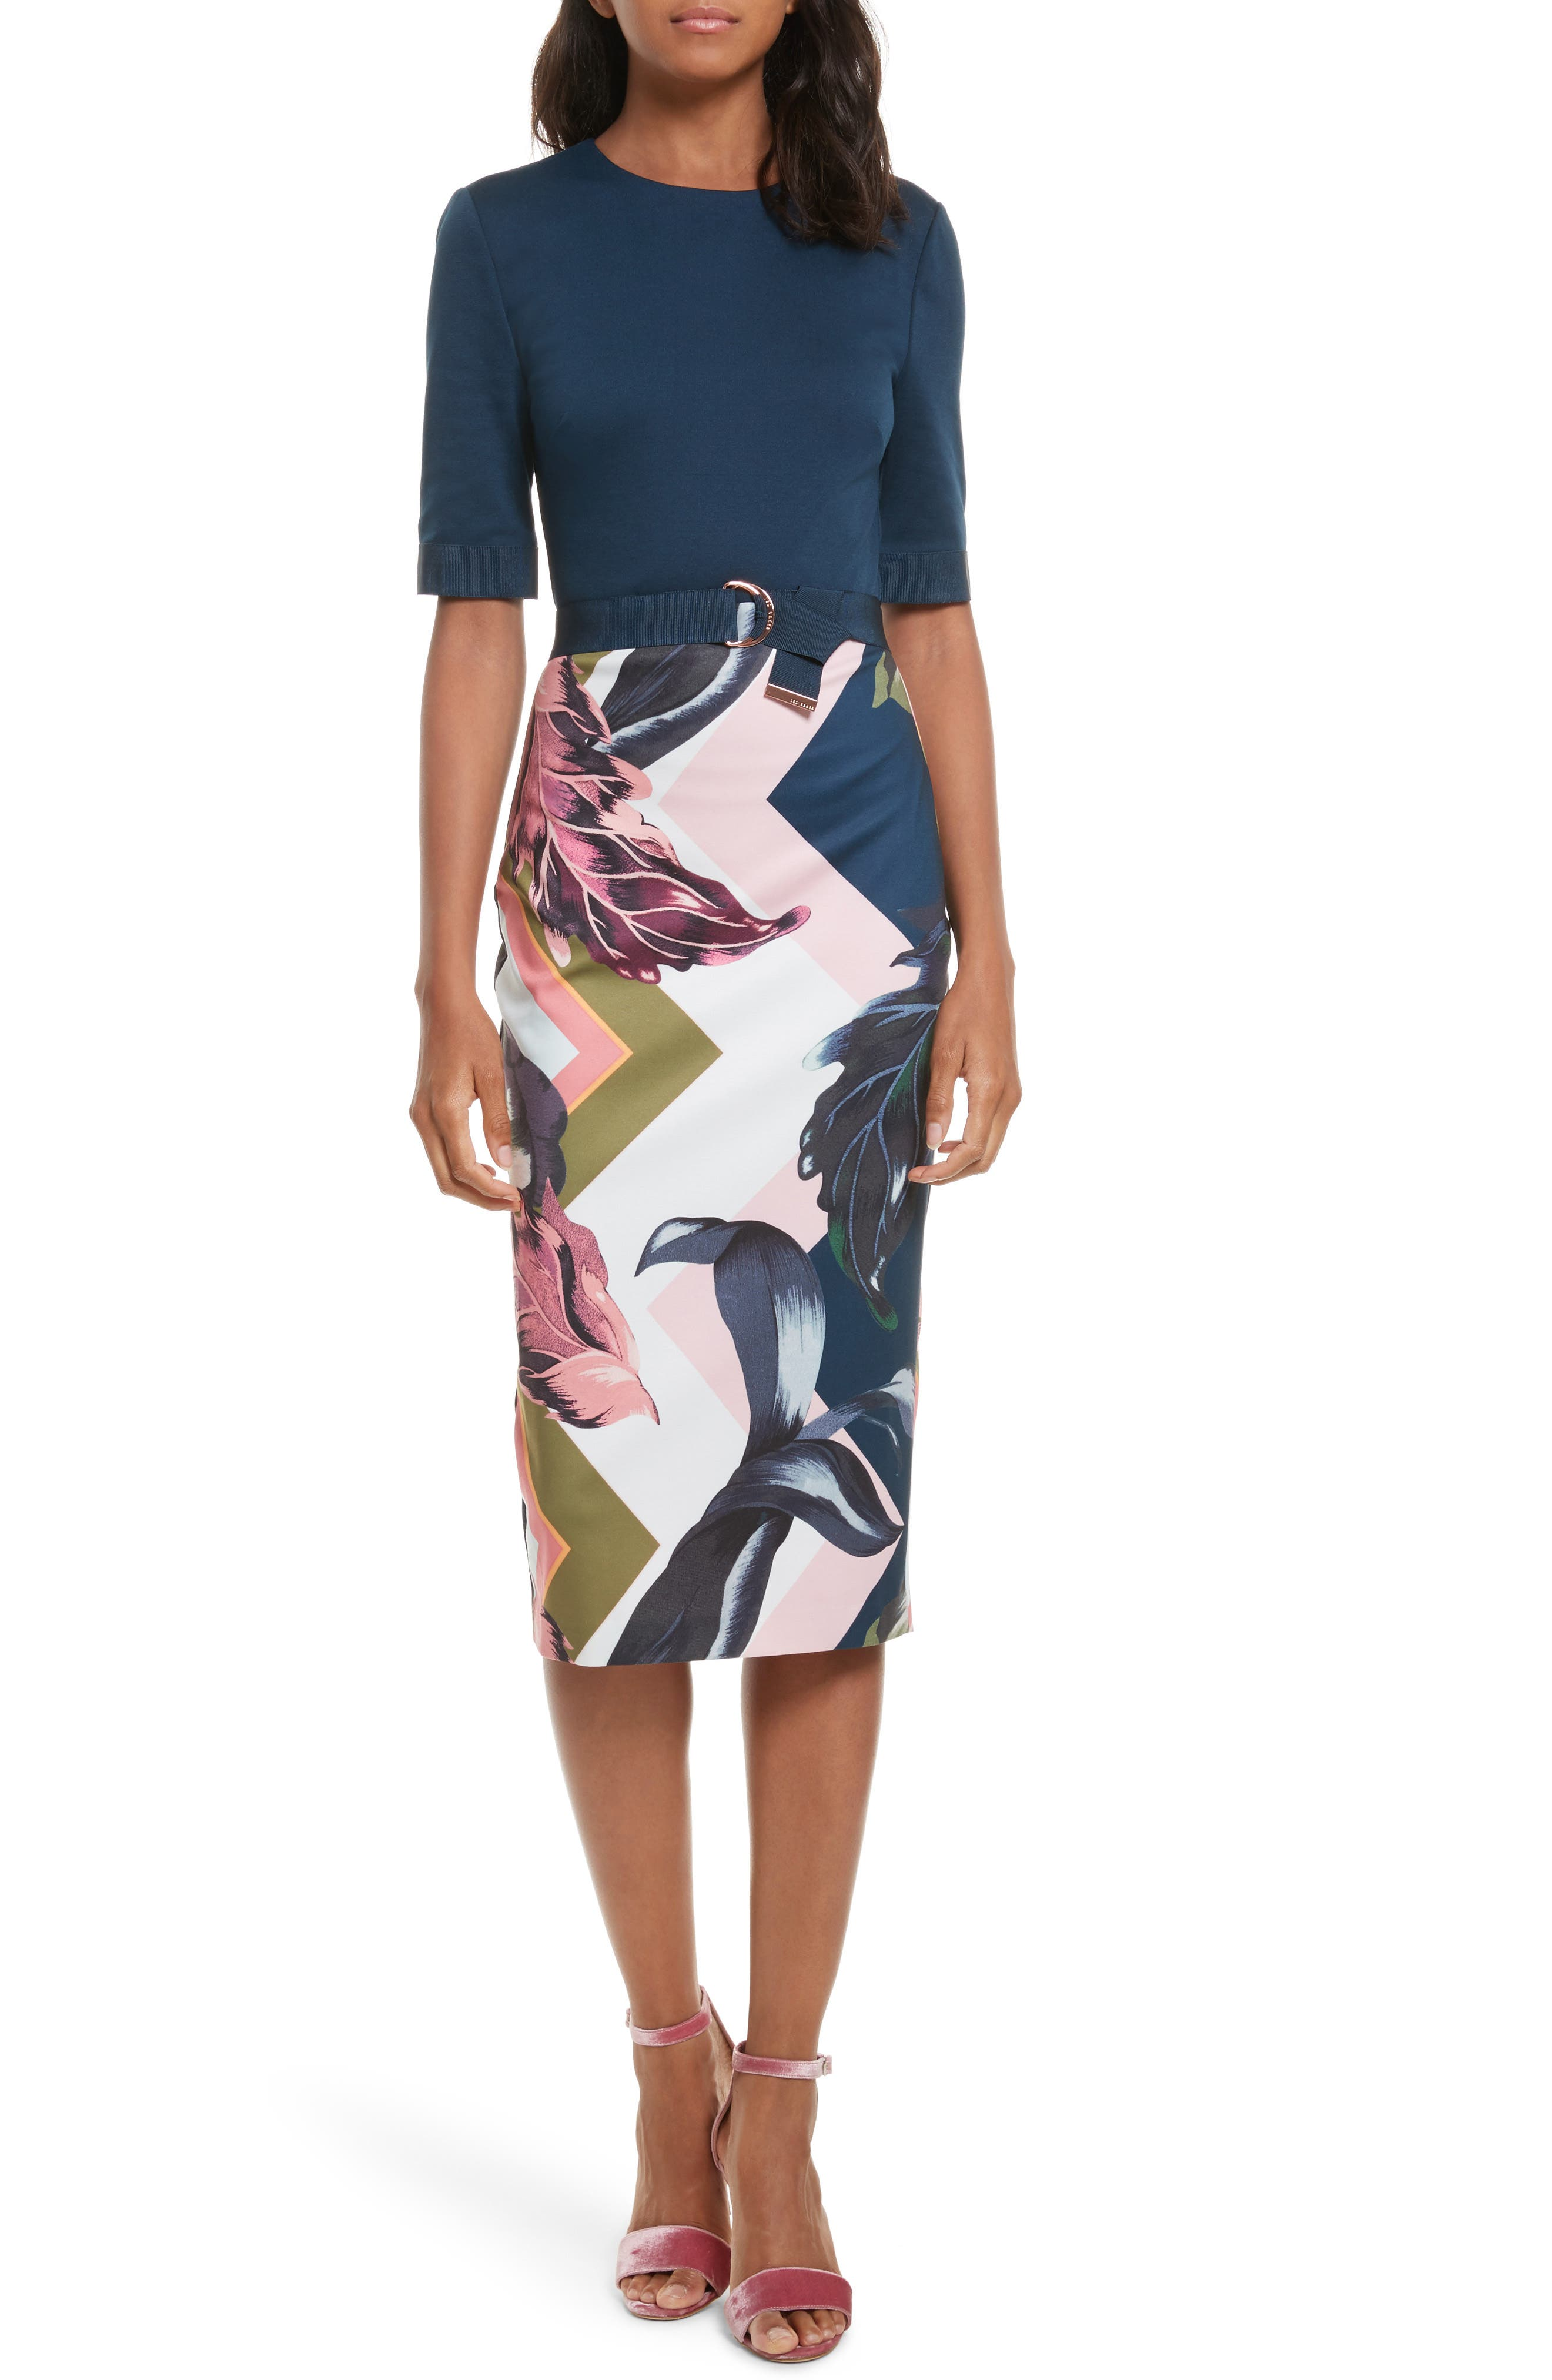 Casiew Eden Body Con Dress,                         Main,                         color, 680